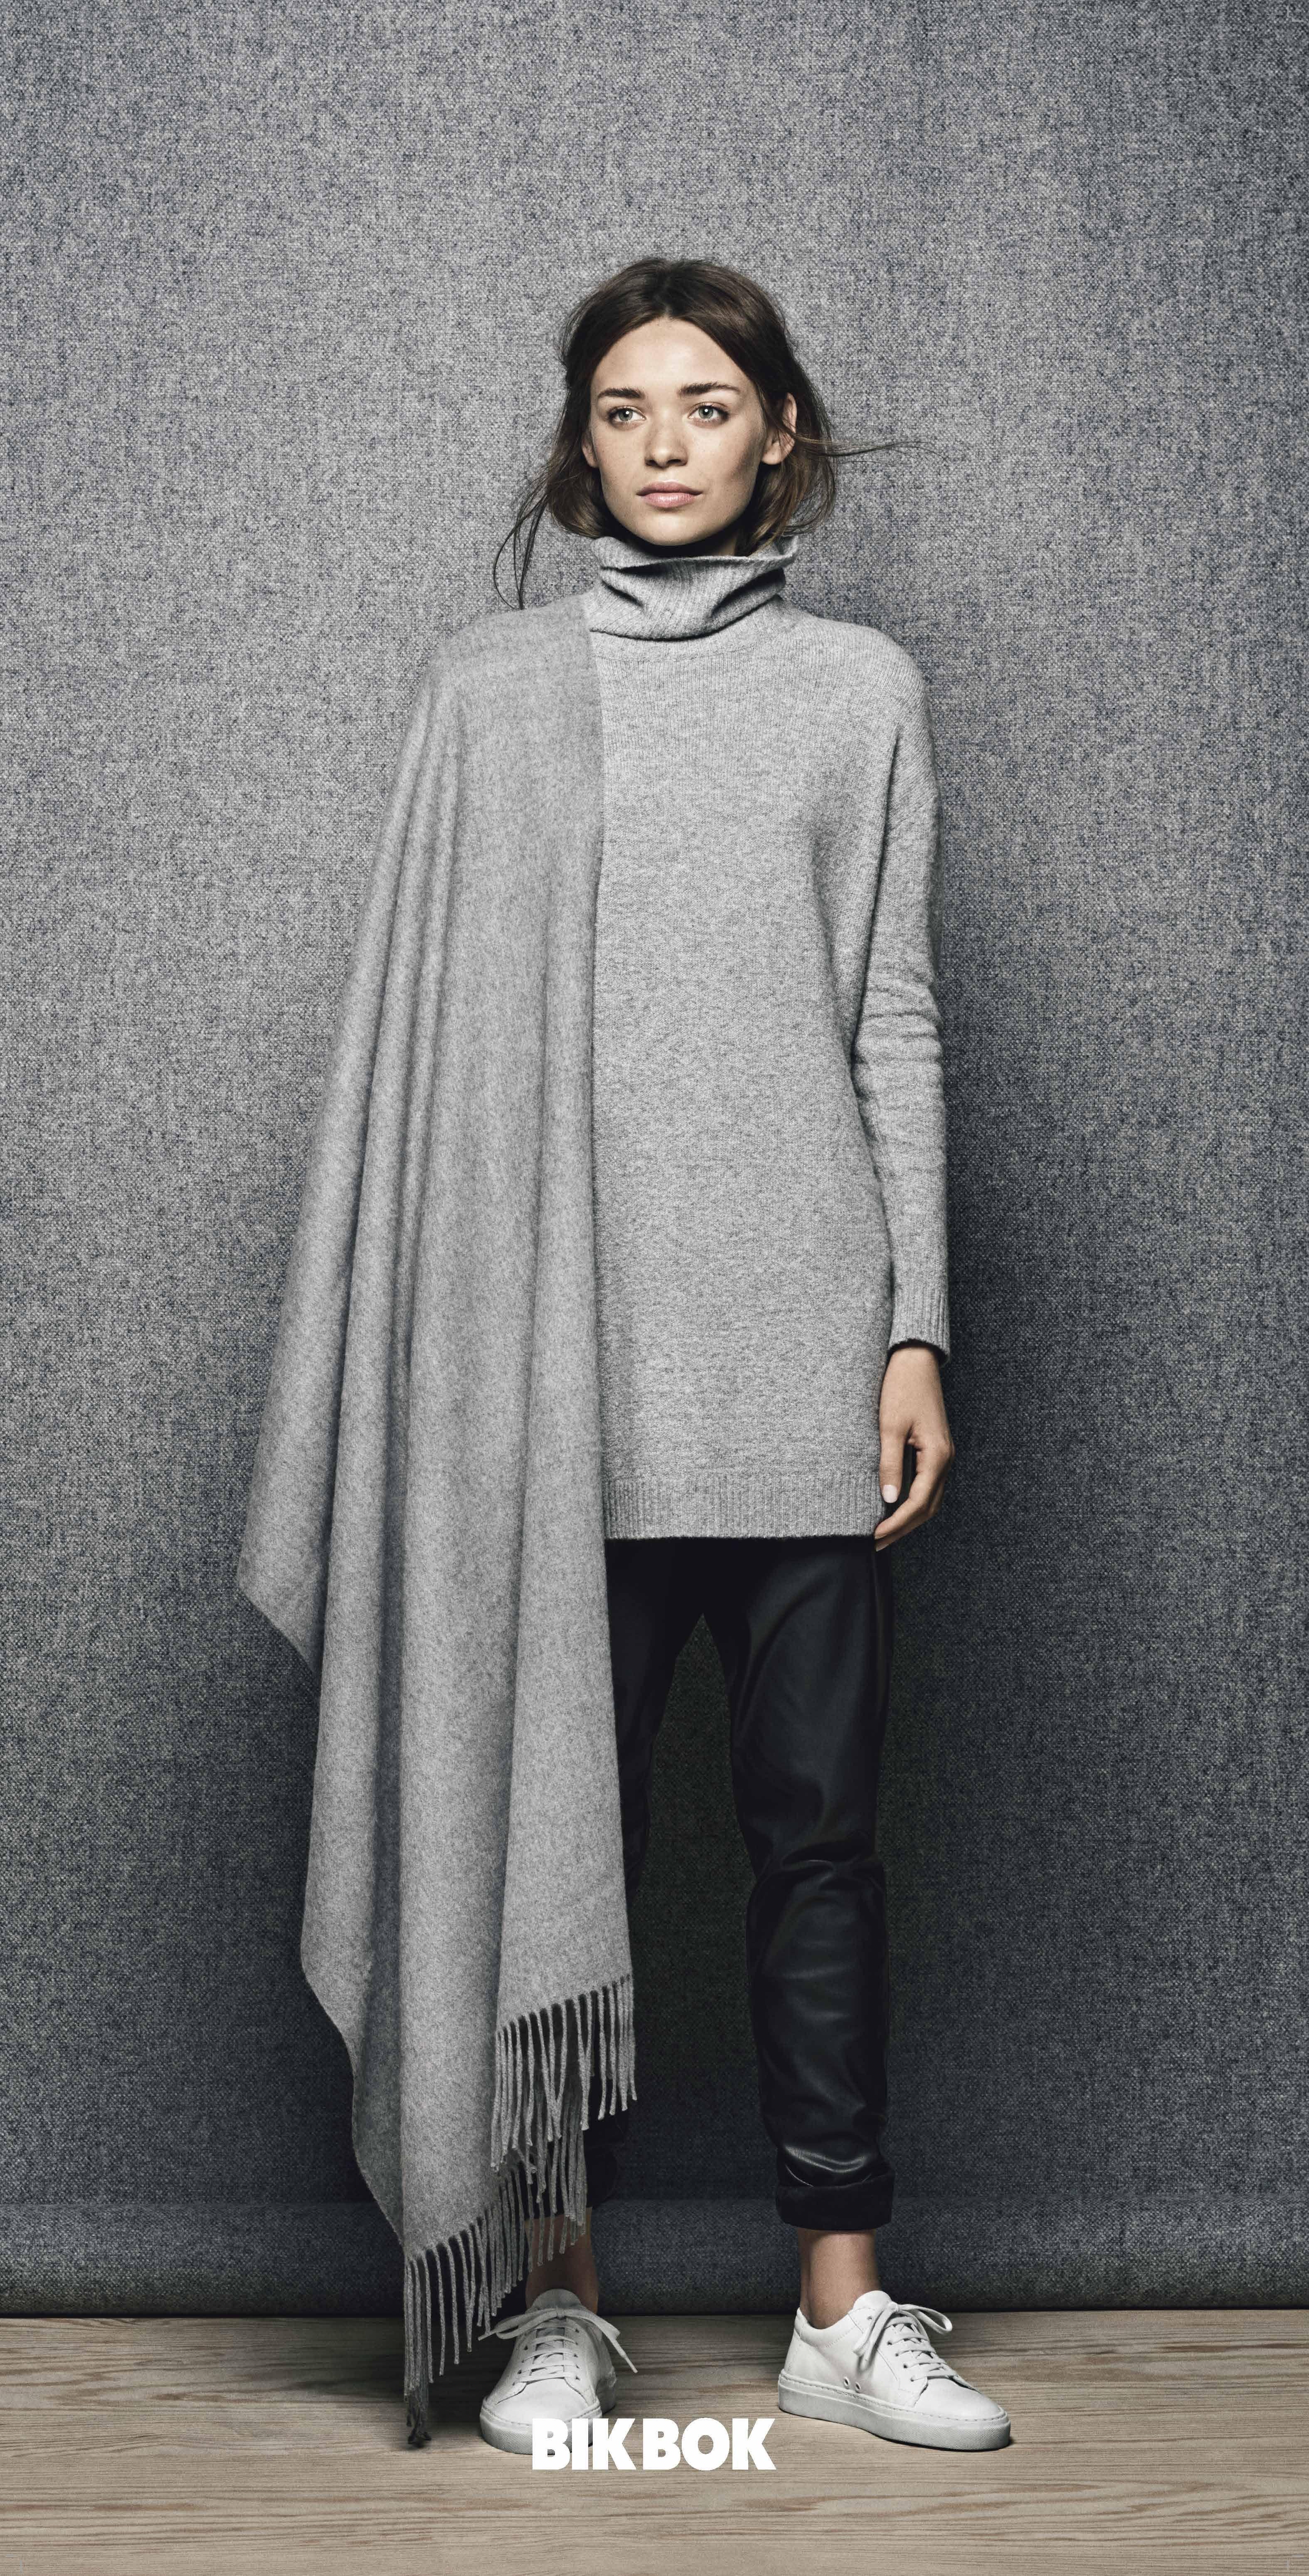 Bik Bok Fall knits 2015 www.bikbok.com  Photo: Trine Hisdal Ad: Karen Hetland & Helene Stålem Sørensen